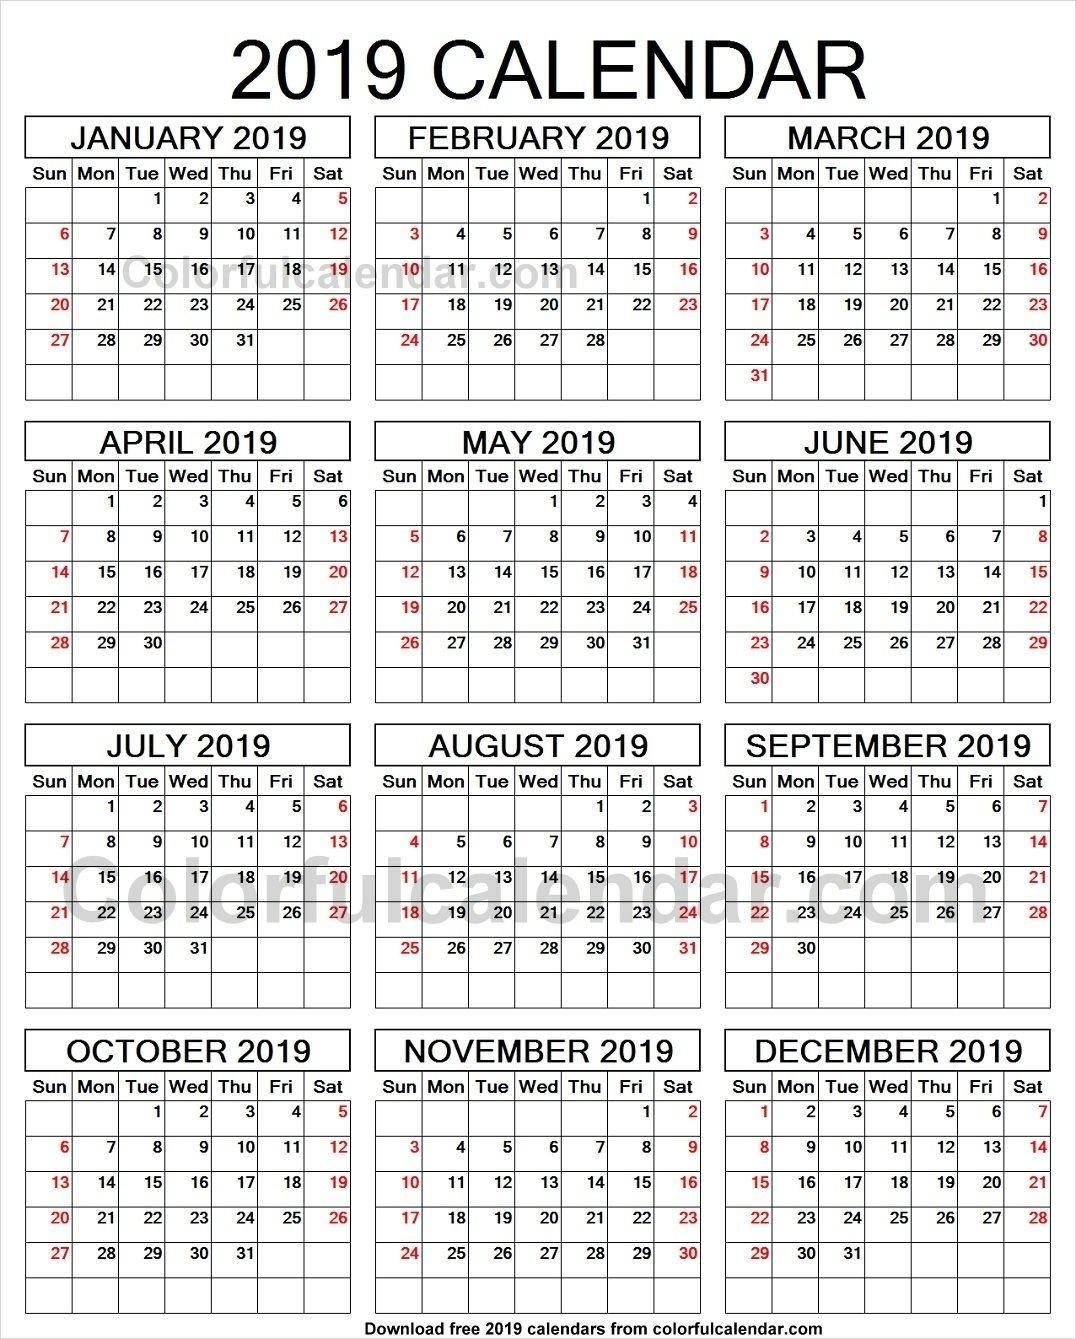 2019 Year Calendar To Print | 2019 Yearly Calendars | Print Calendar_Printing A Calendar For 2019